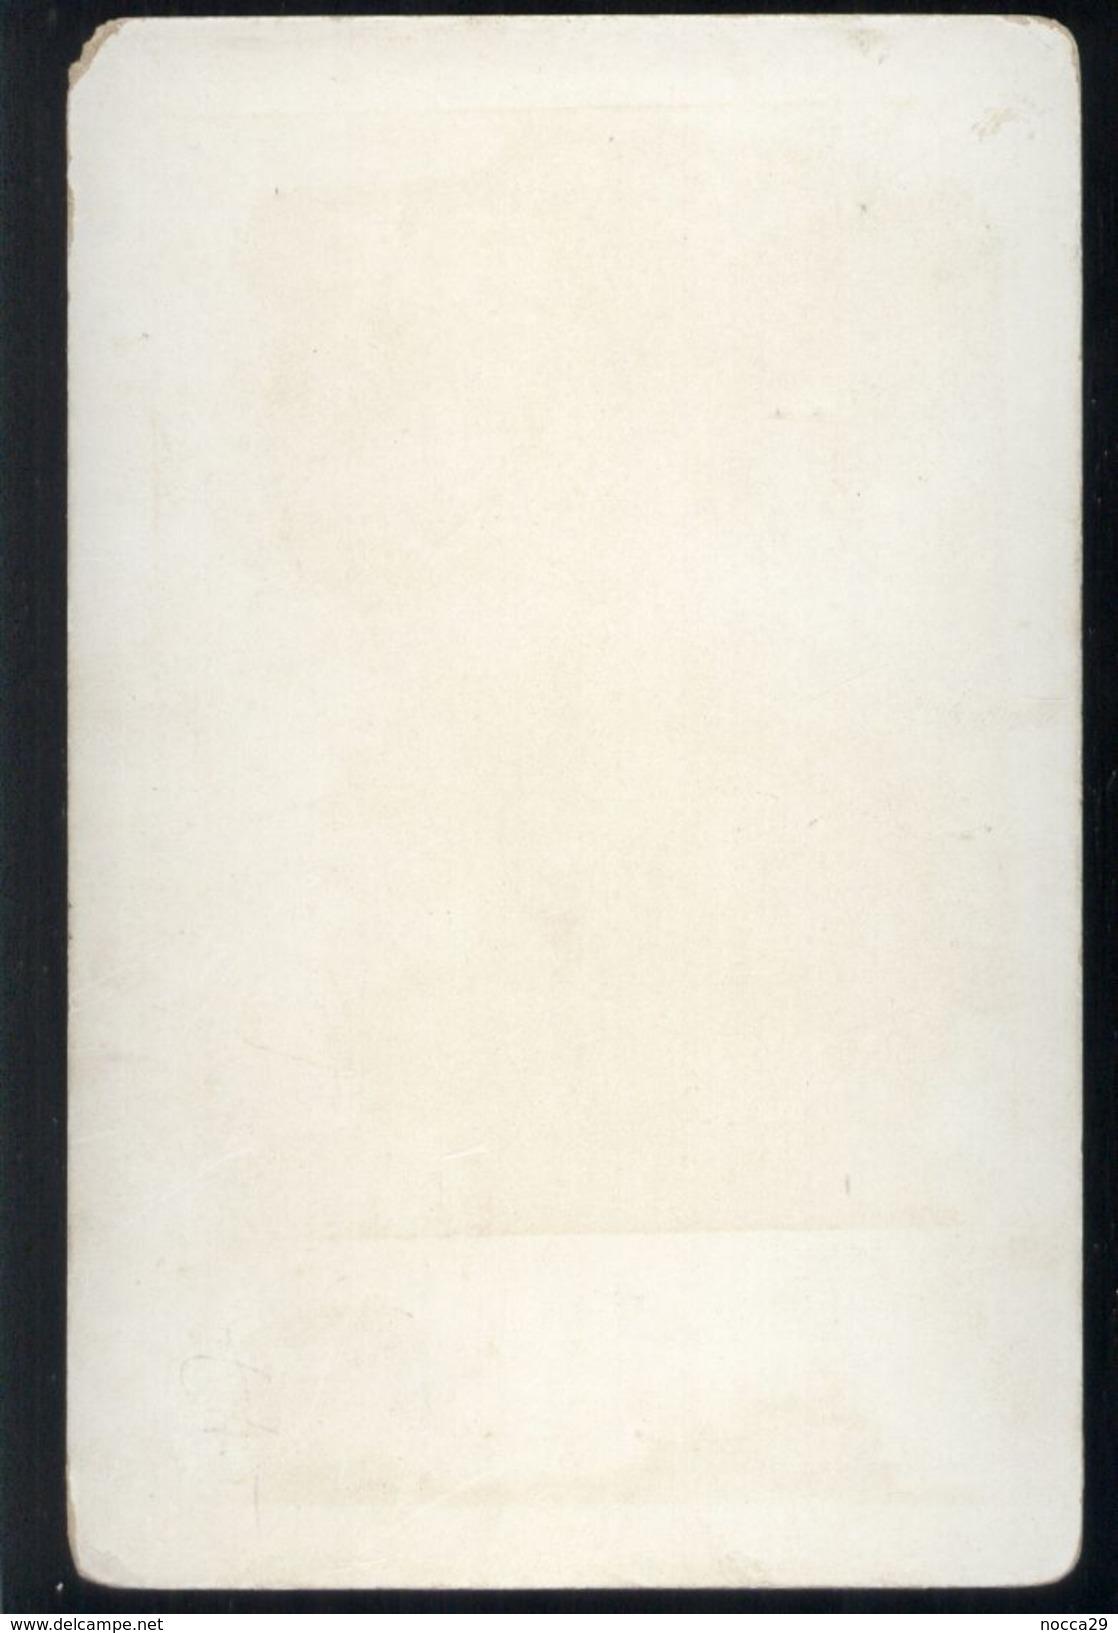 BELGIO - GAND - GENT - ANTICA FOTO ORIGINALE ALL'ALBUMINA FINE '800 SU CARTONCINO DOPPIO - MAISON DES TISSERANDS - Gent